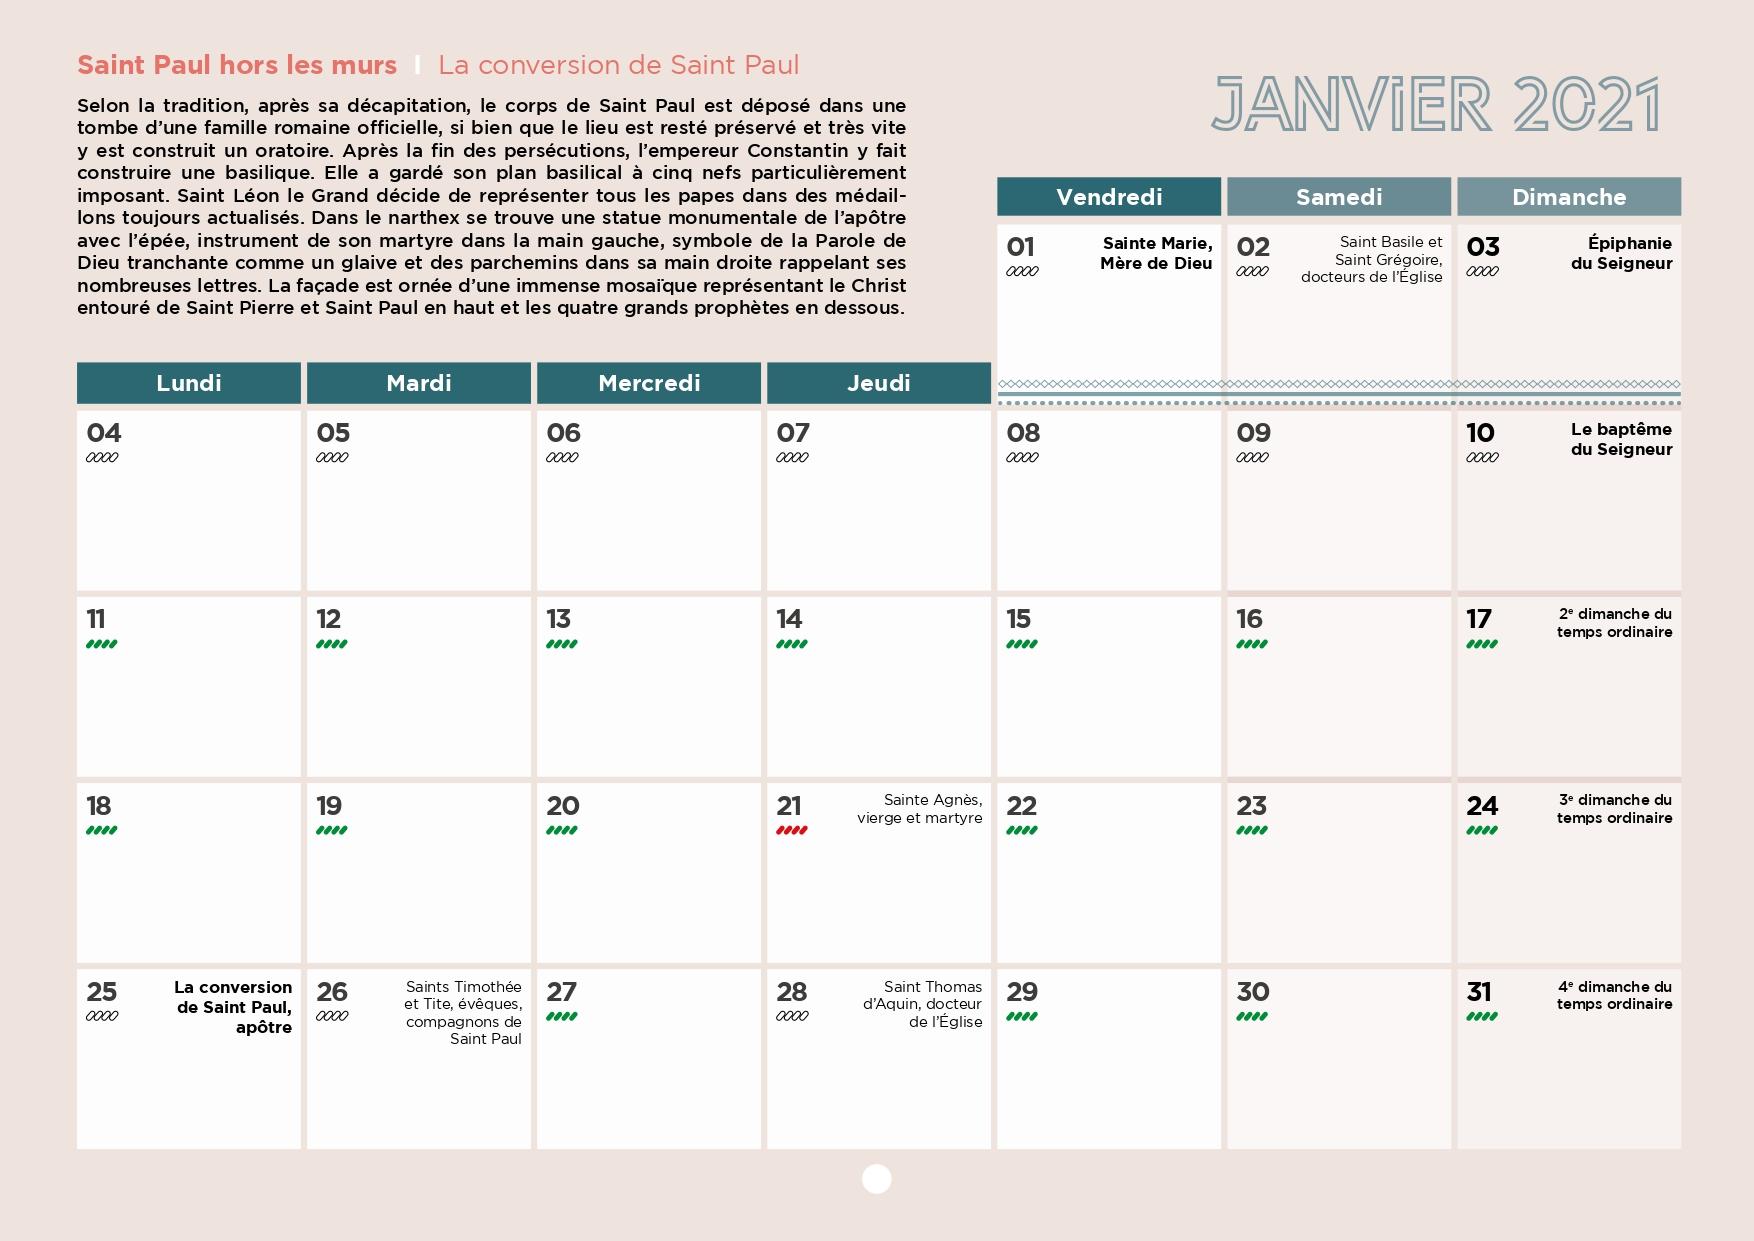 Calendrier Servants-2021-web- p 1-9 (002)_page-0005